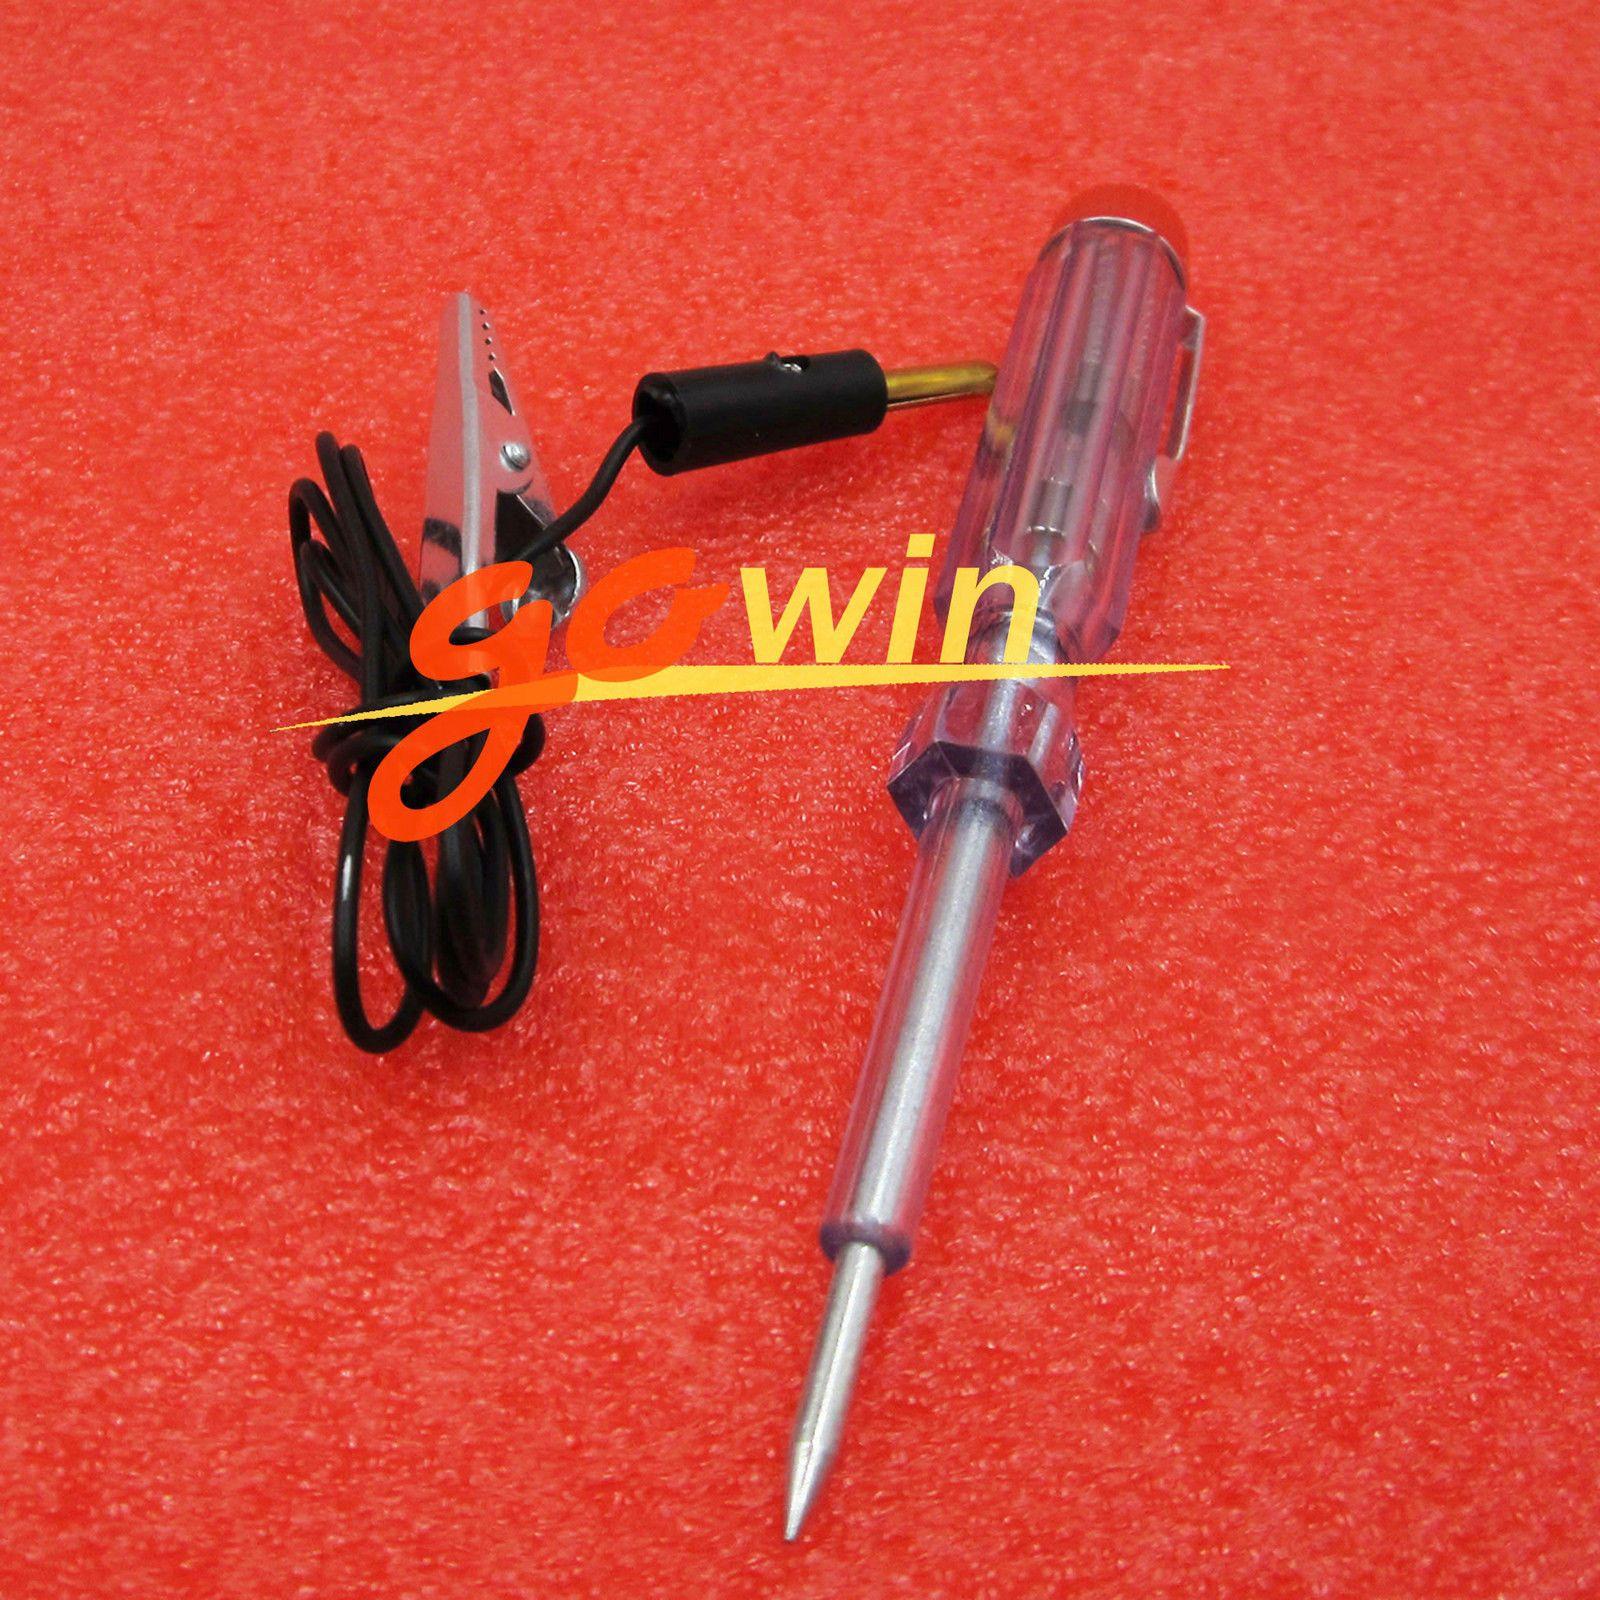 New Dc 6v 12v 24v Auto Car Motorcycle Circuit Voltage Tester Pen In Ebay 099 Electronics